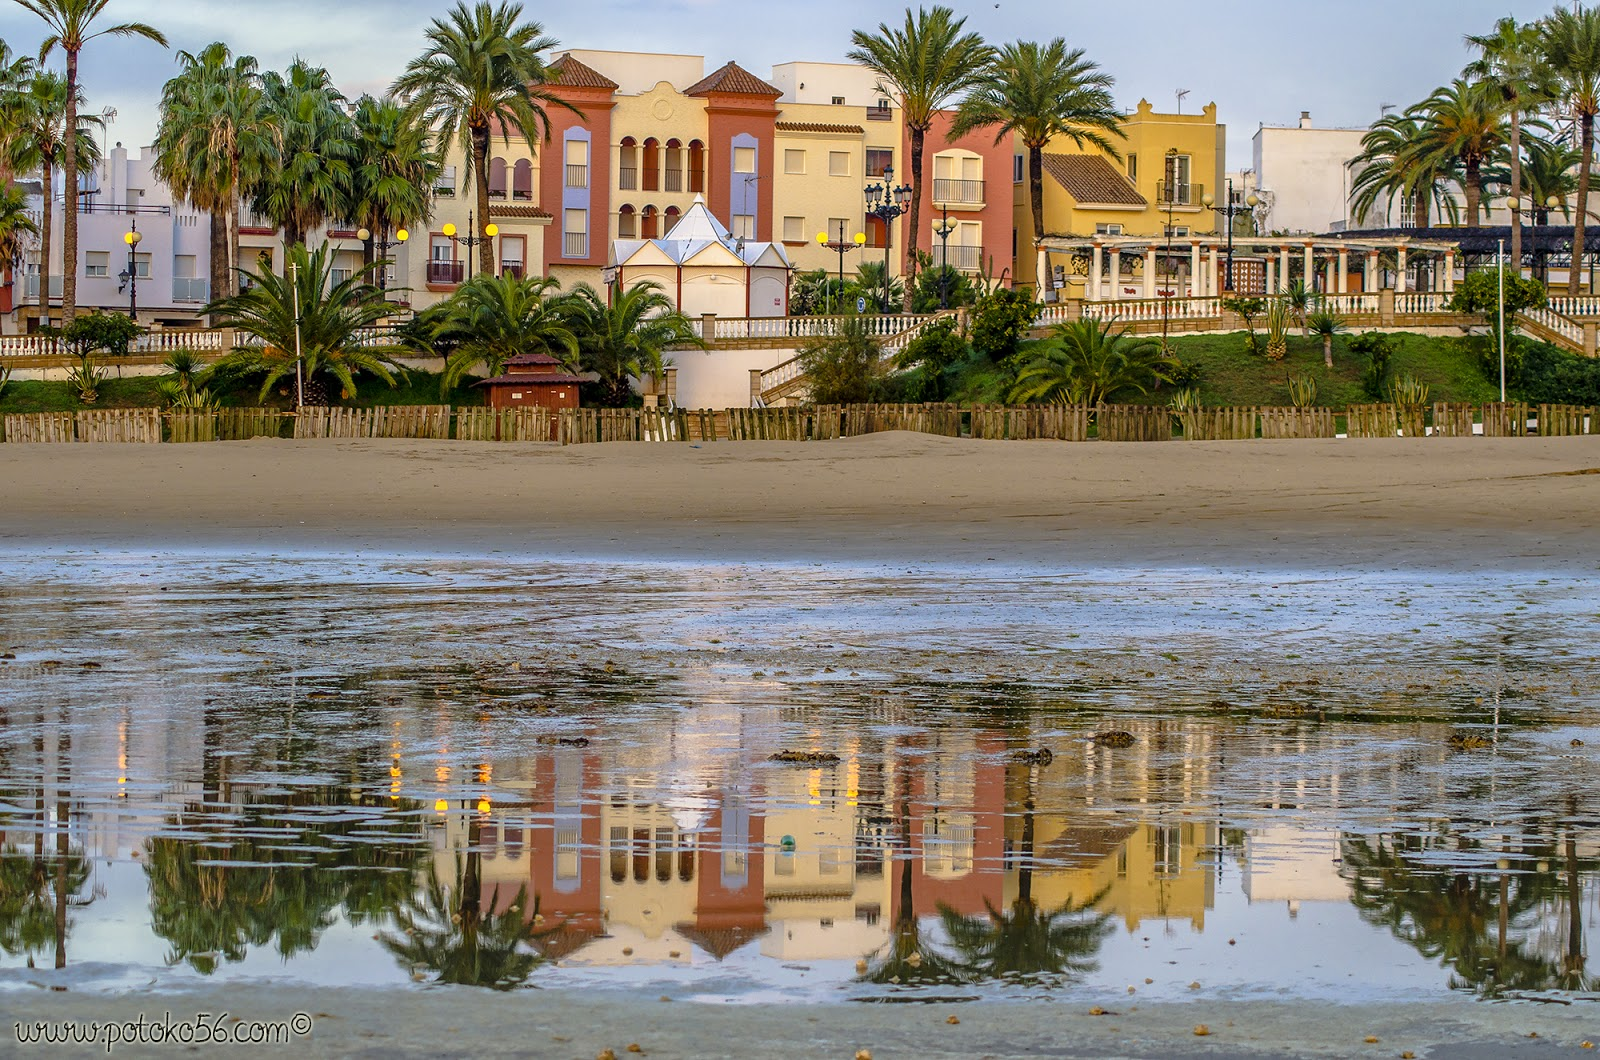 Reflejos en la orilla de la playa del Chorrillo en Rota